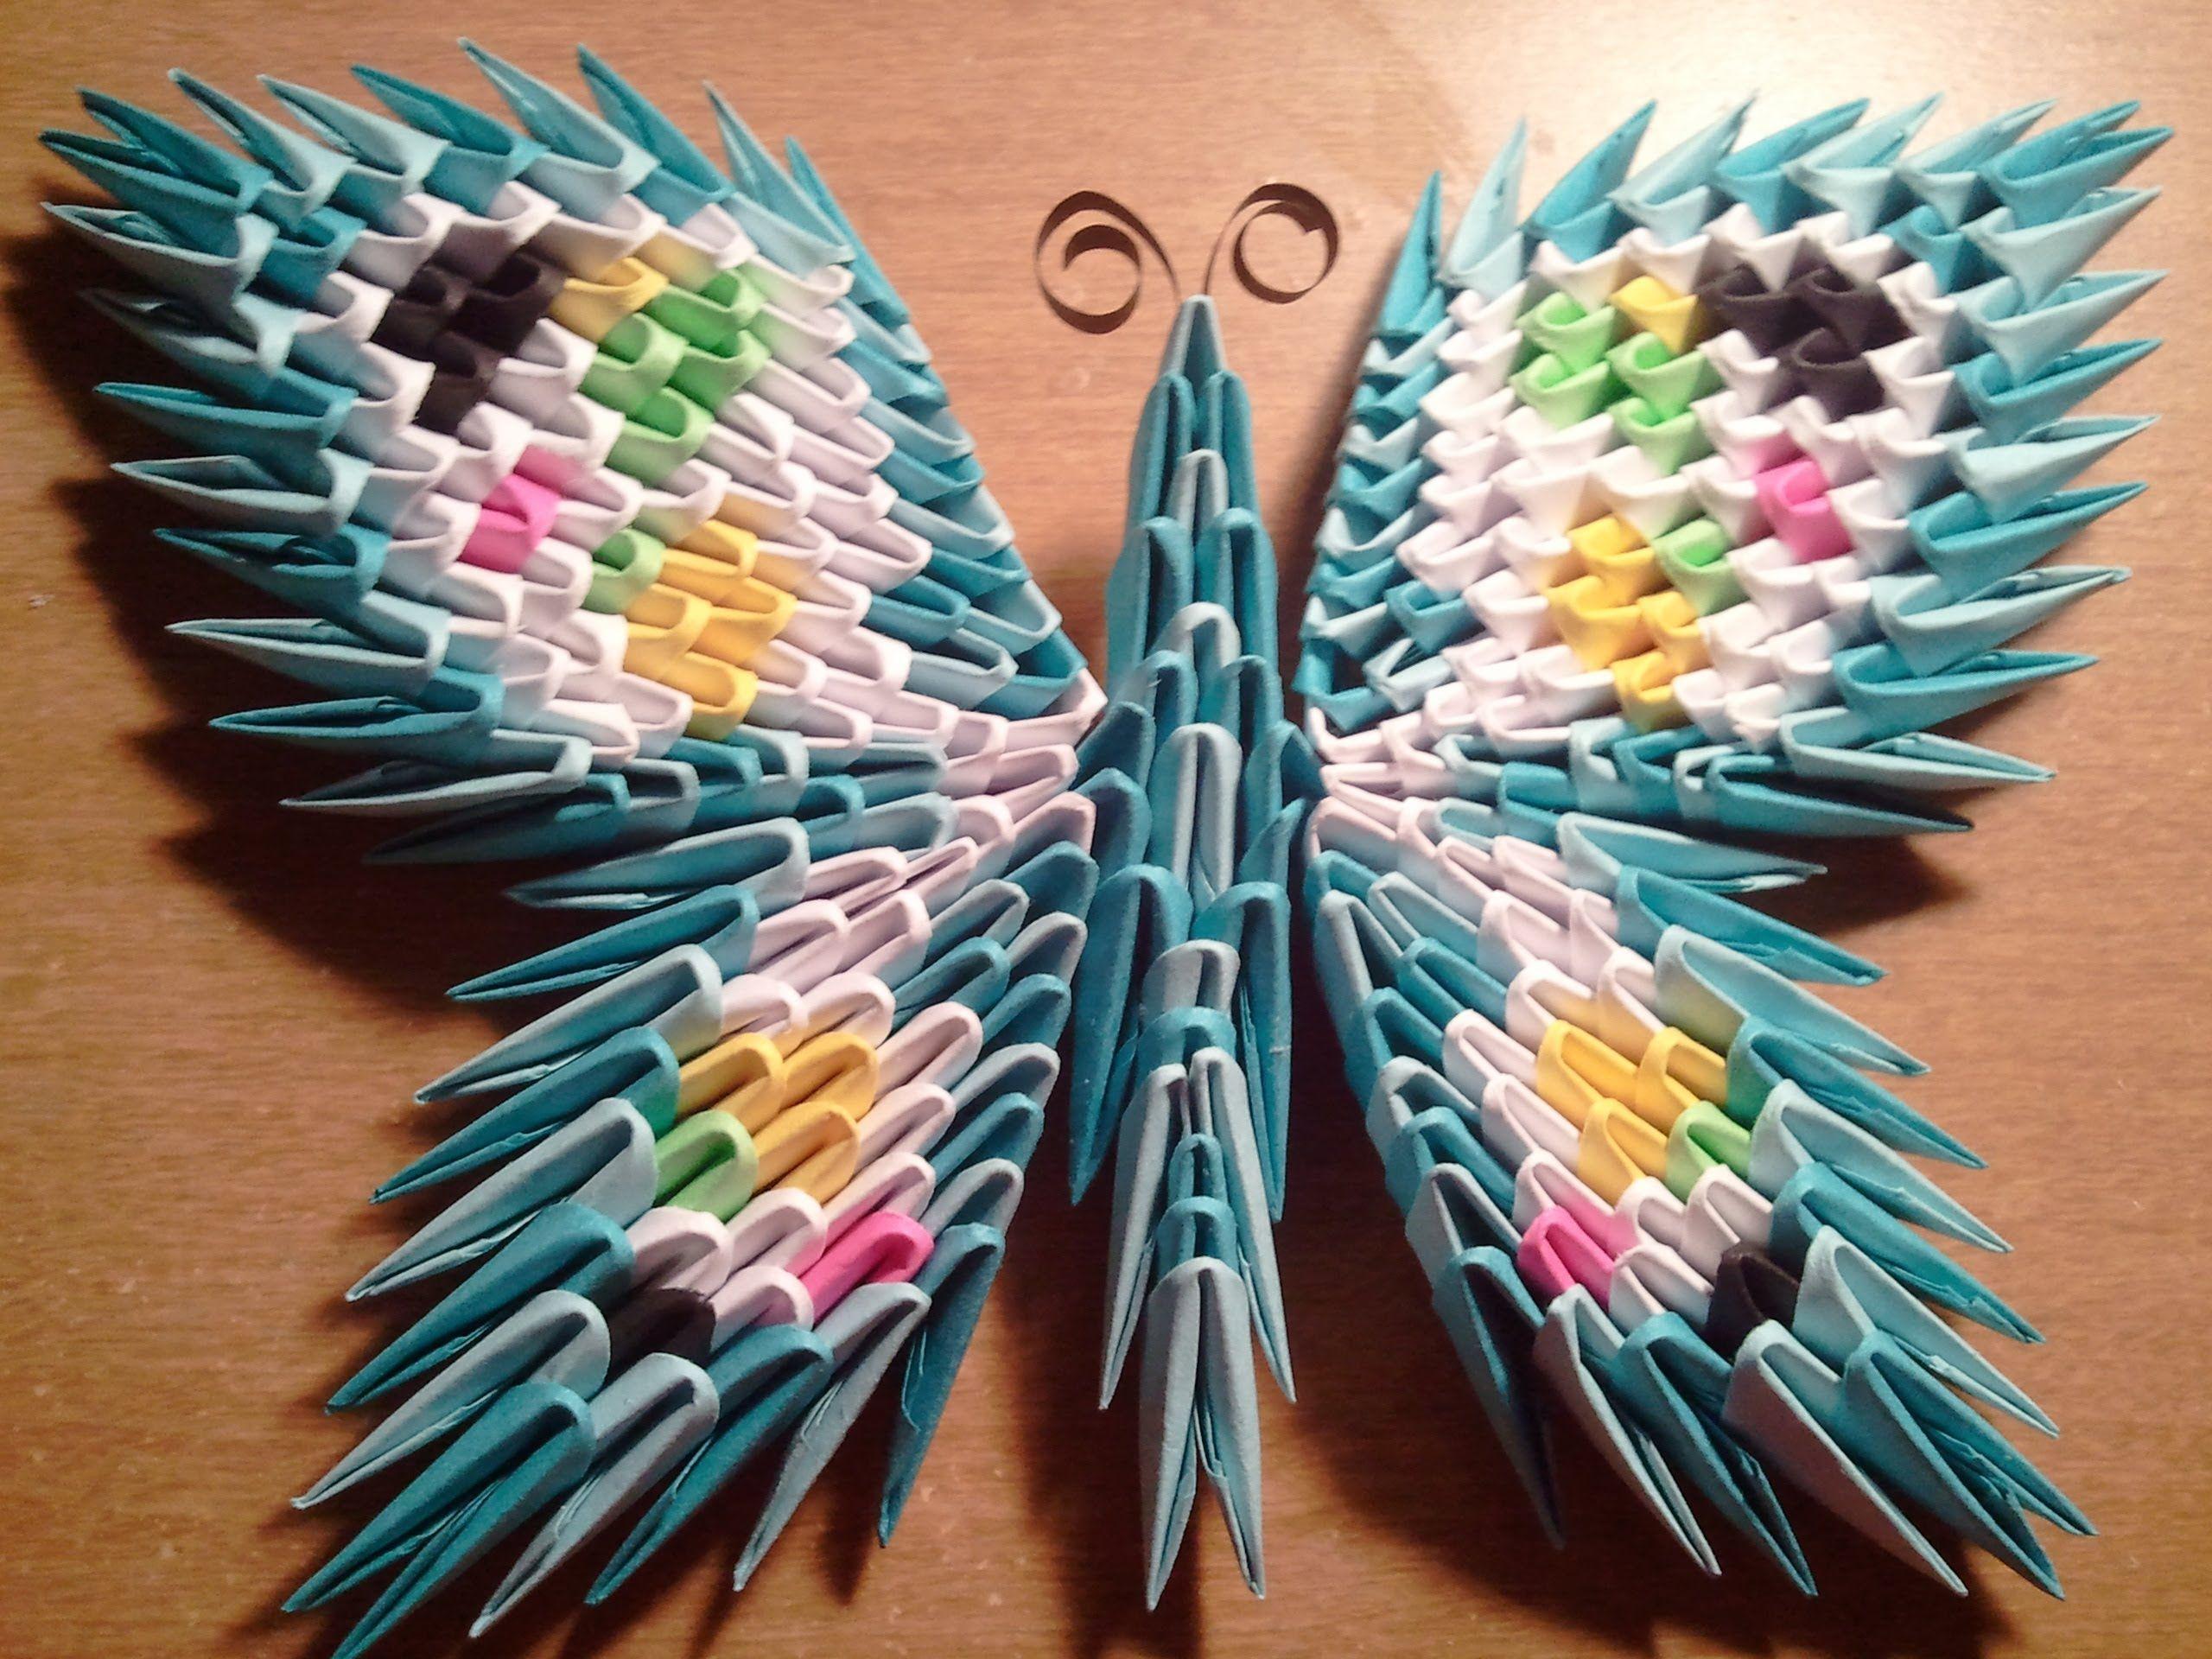 мастер класс оригами павлин схема 3д